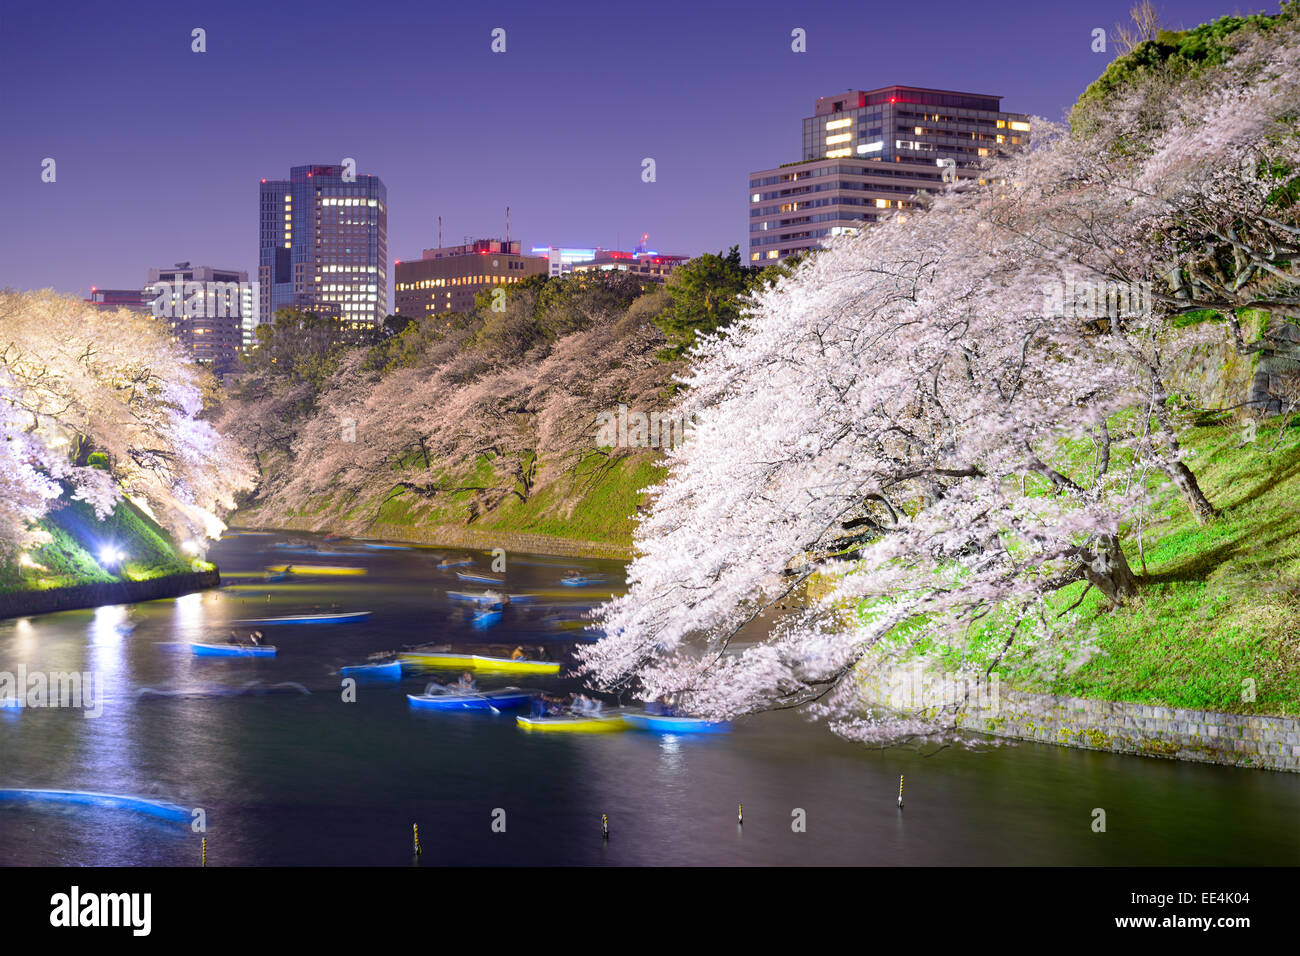 Tokyo, Japan am Chidorigafuchi Imperial Palace Graben im Frühling. Stockbild